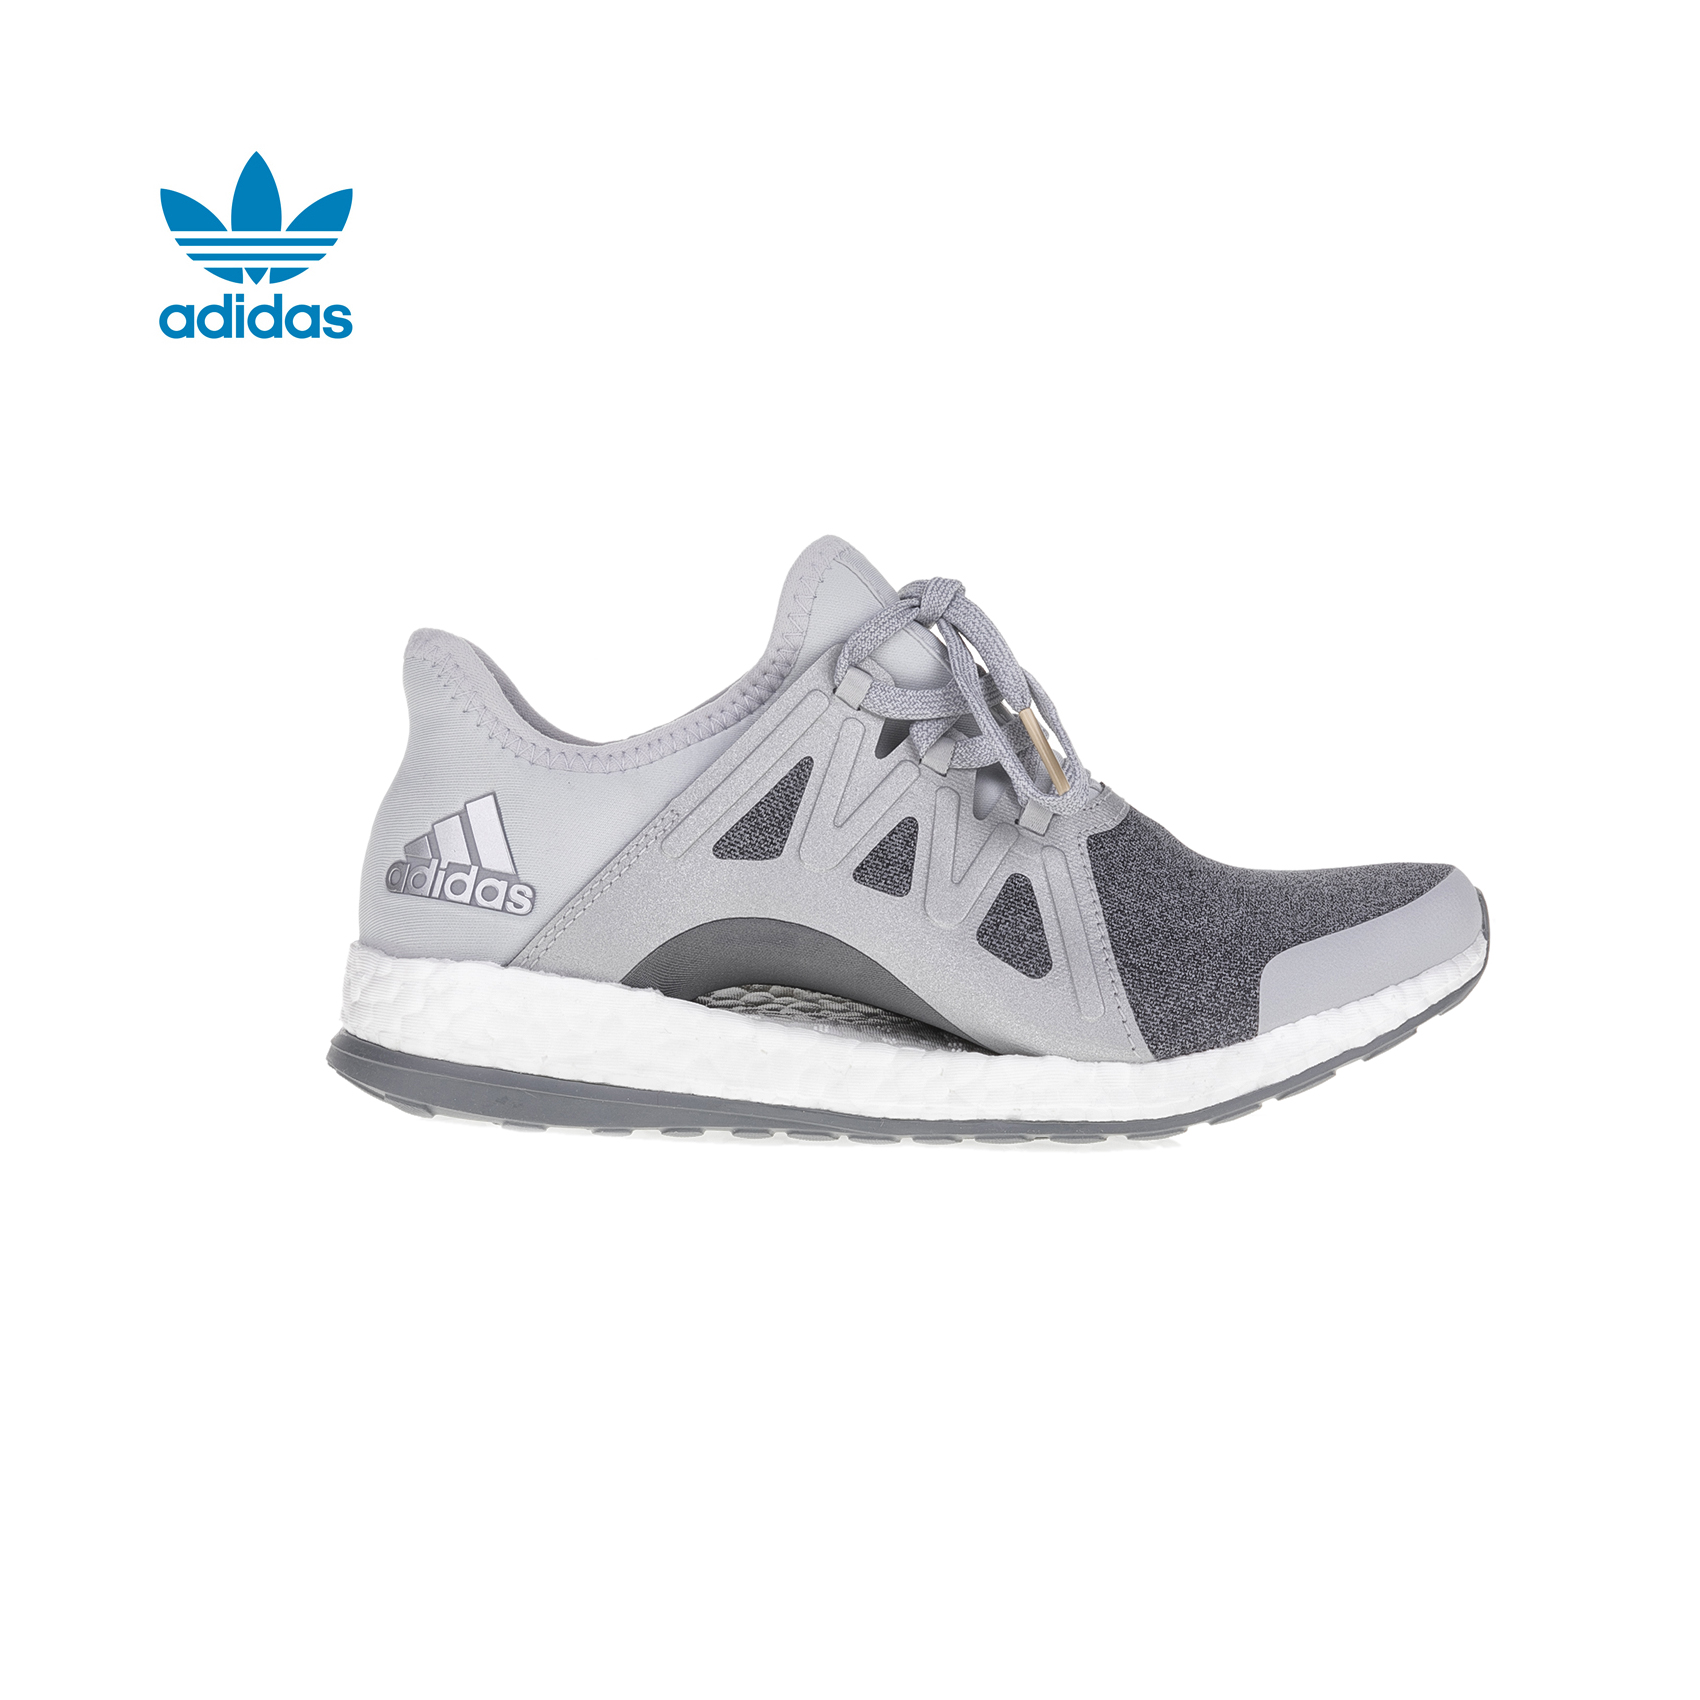 san francisco 471bb 33e38 adidas Originals - Γυναικεία παπούτσια adidas PureBOOST X 2 γκρι